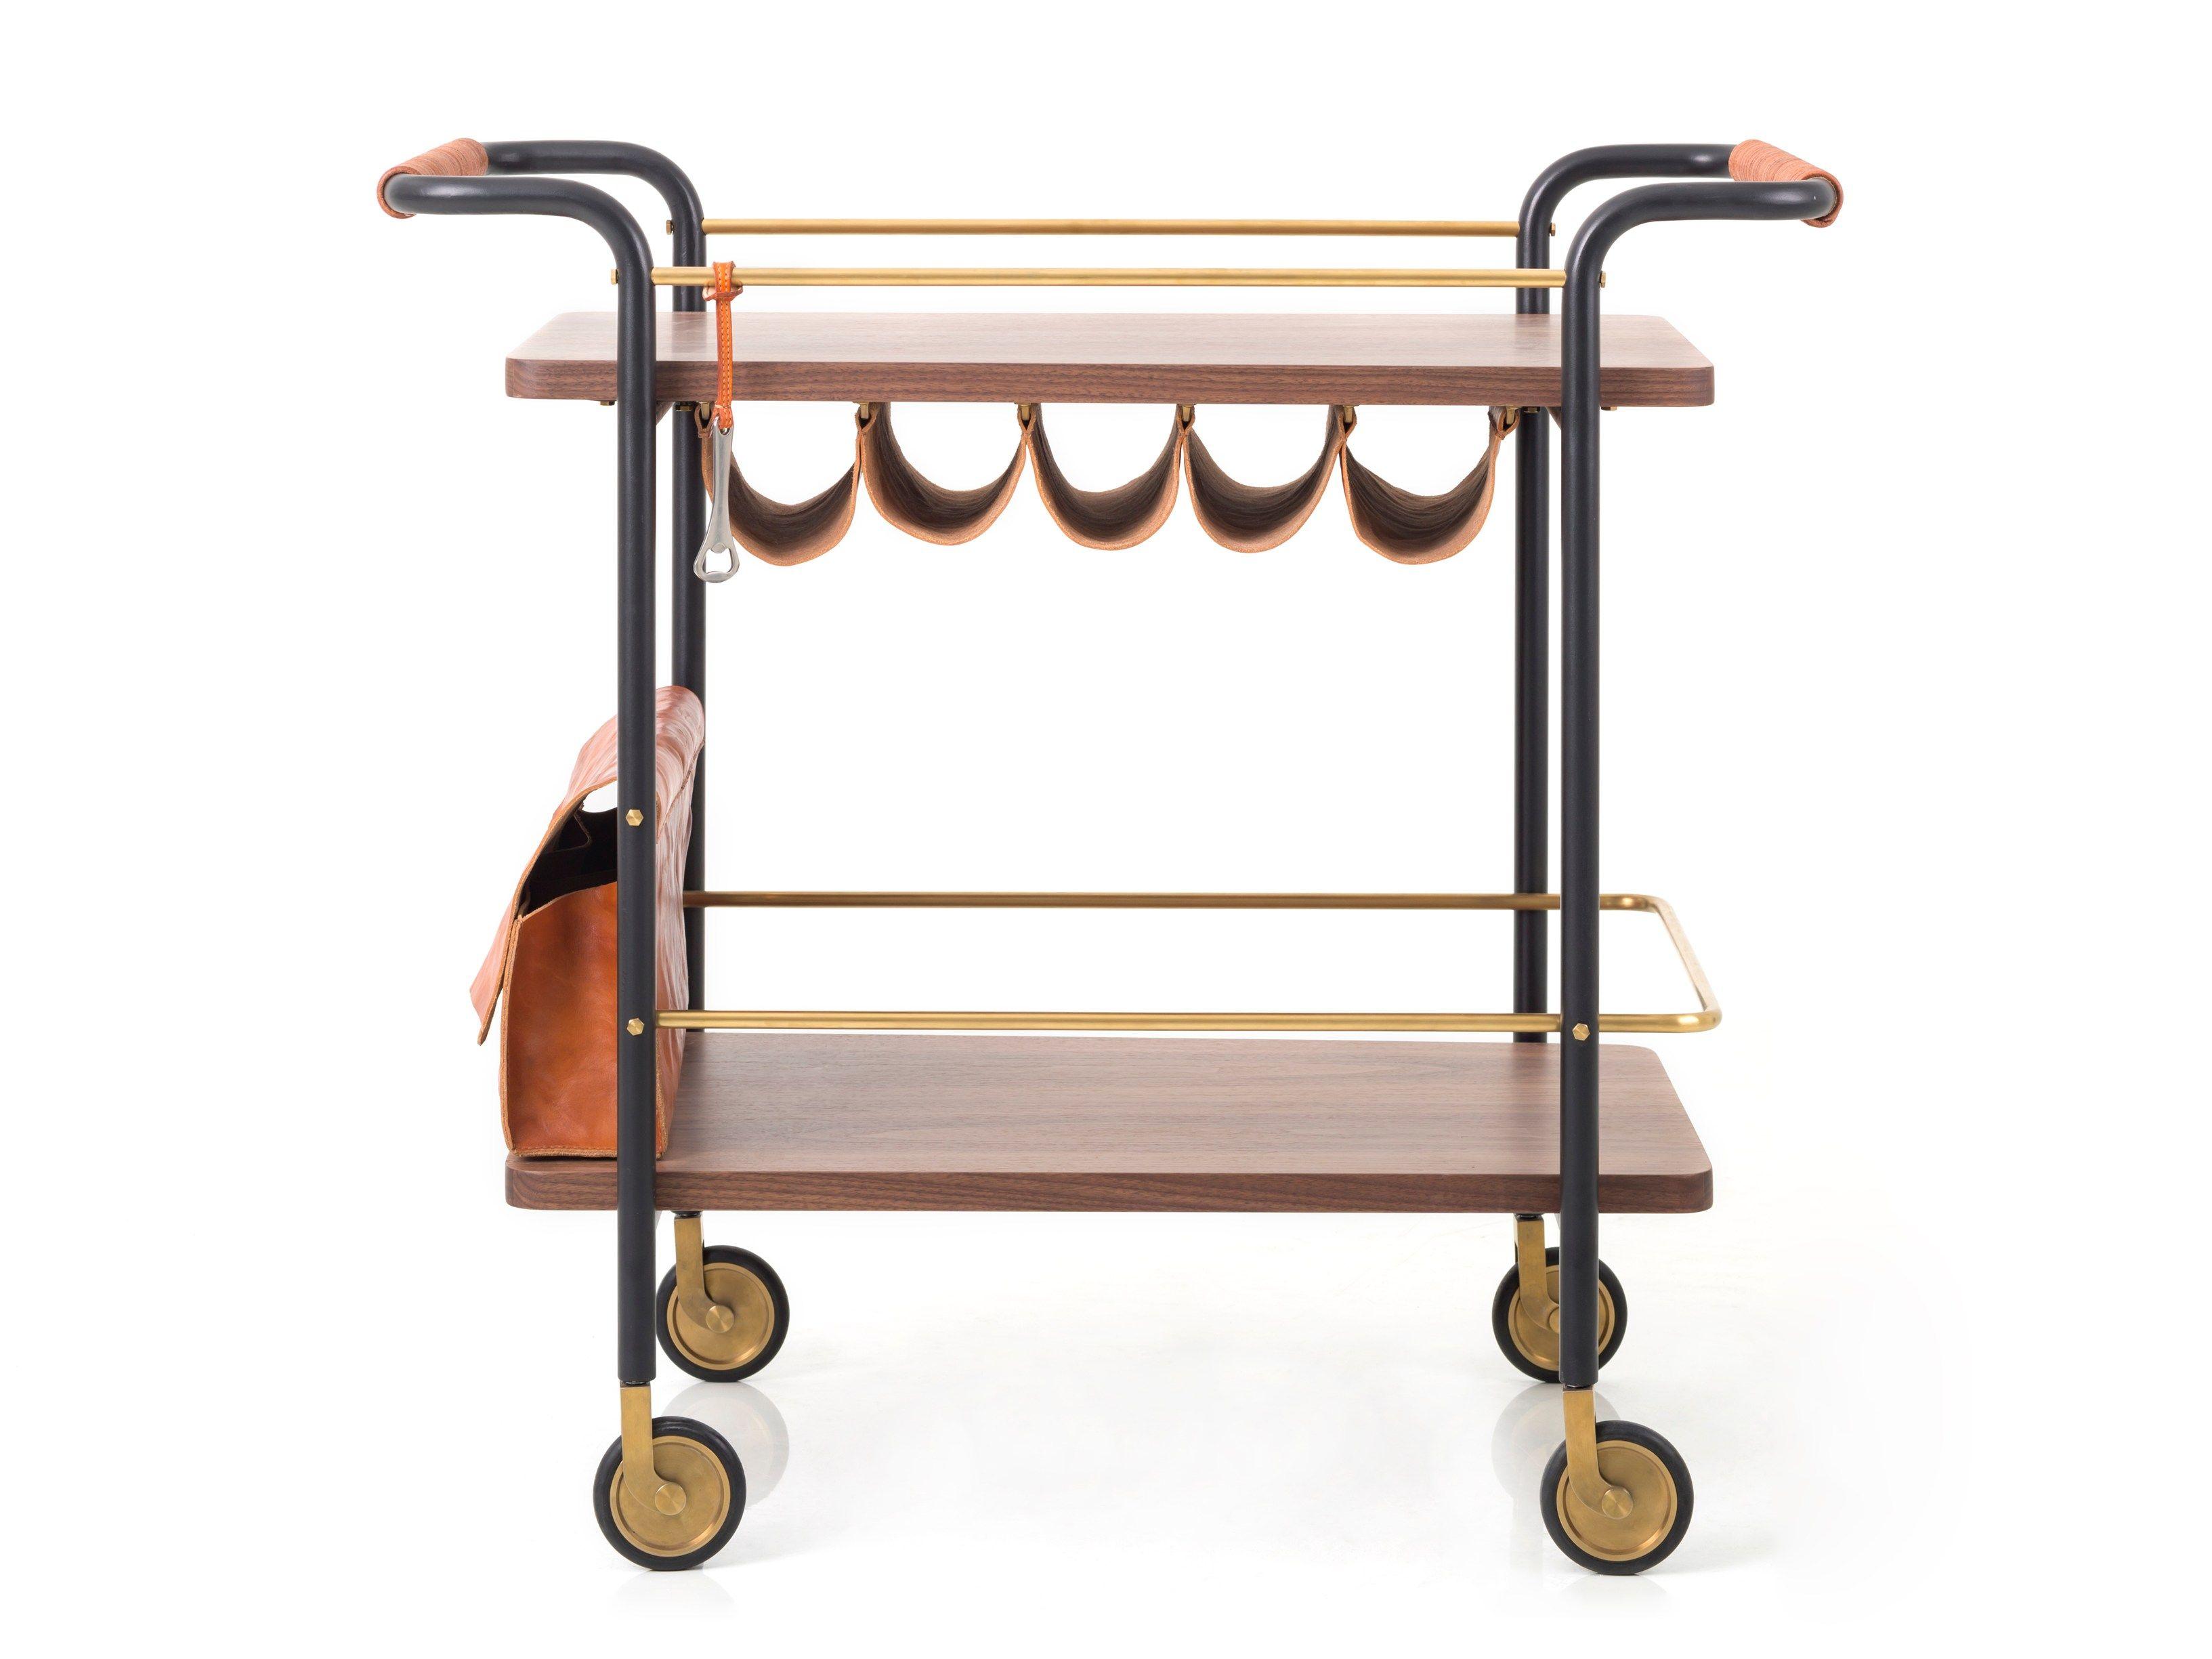 Bar cart valet bar cart valet collection by stellar works design david rockwell - Carrito bebidas ...